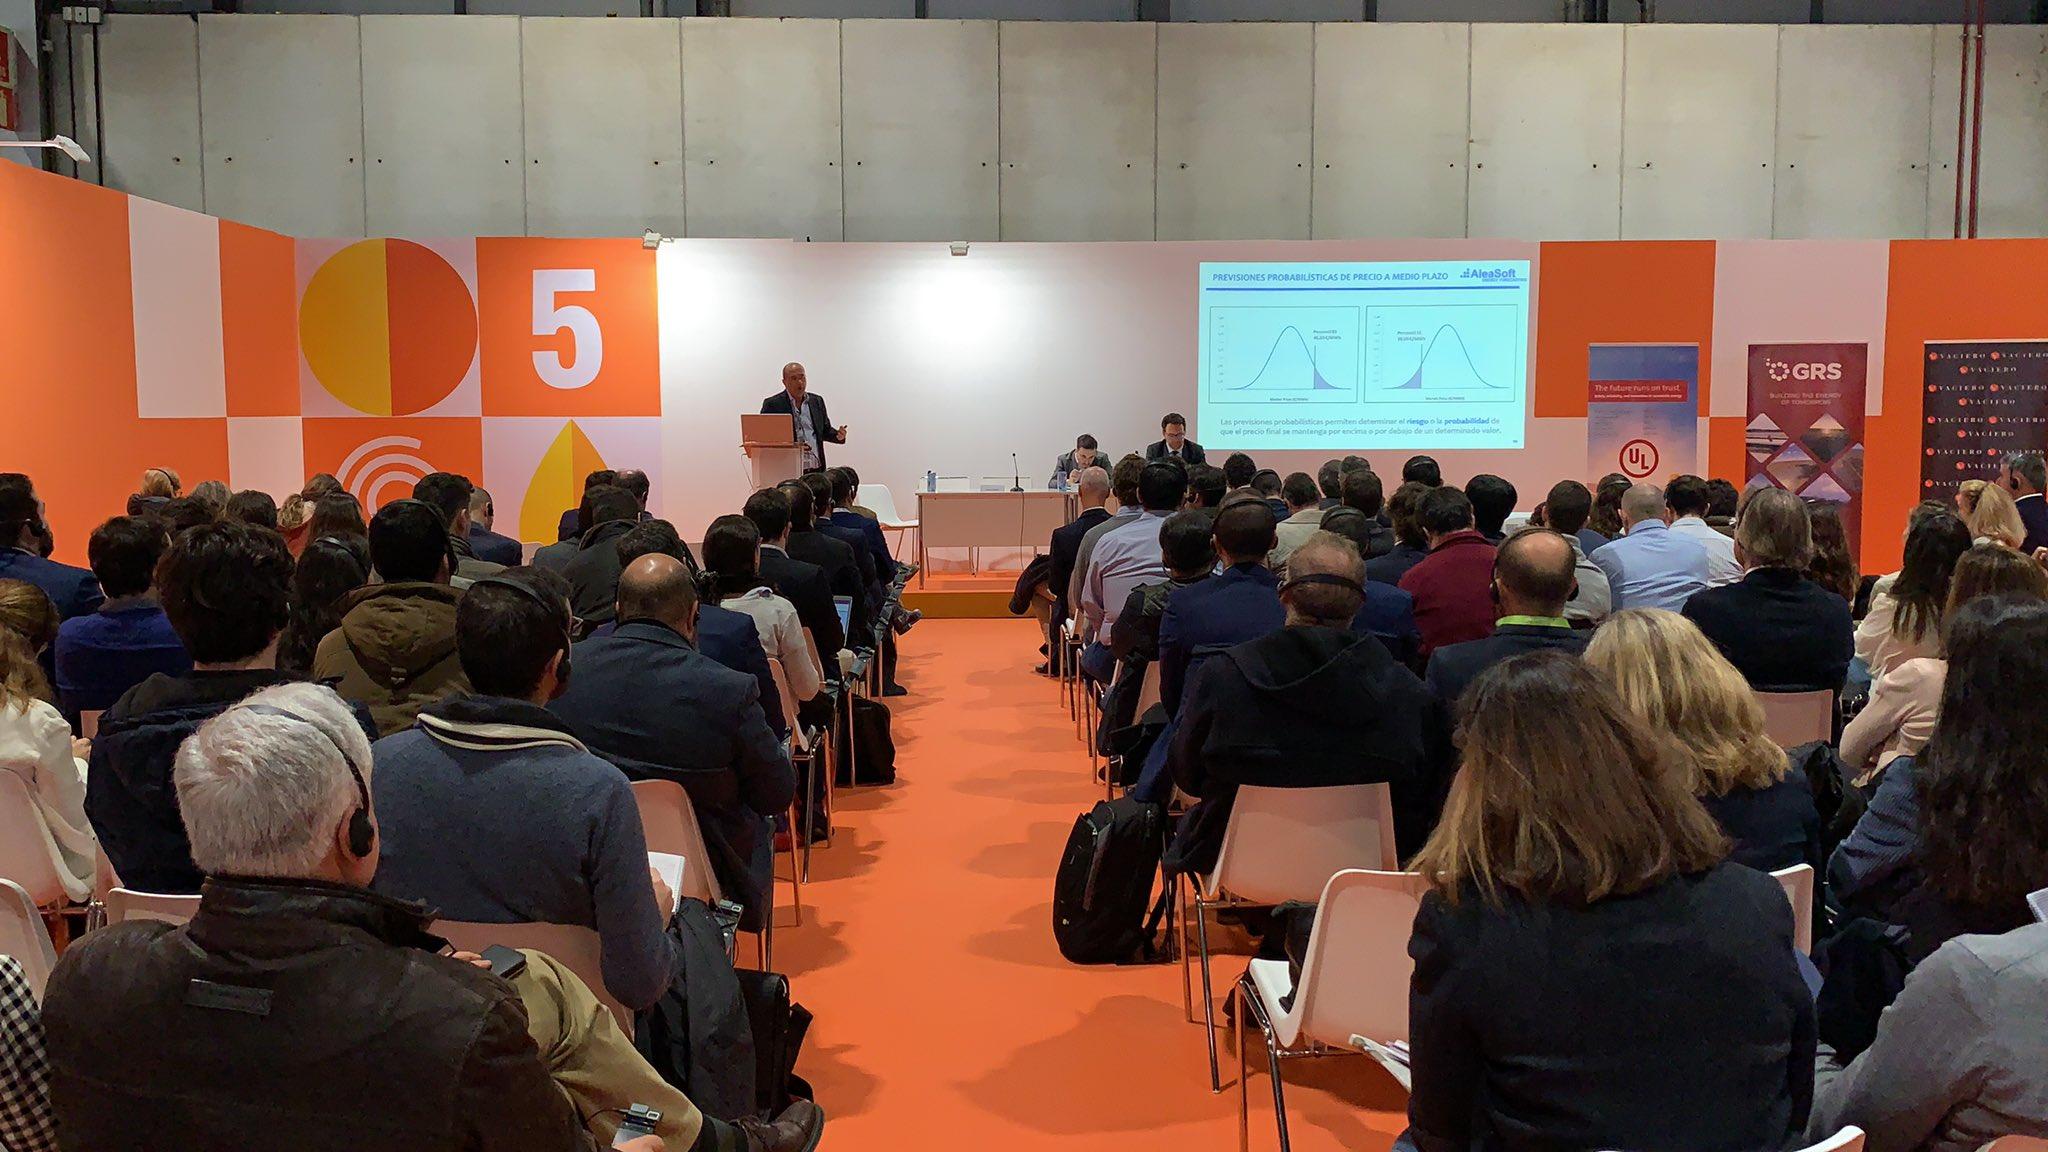 AleaSoft - Antonio Delgado GENERA UNEF photovoltaic project finance power market price forecasting